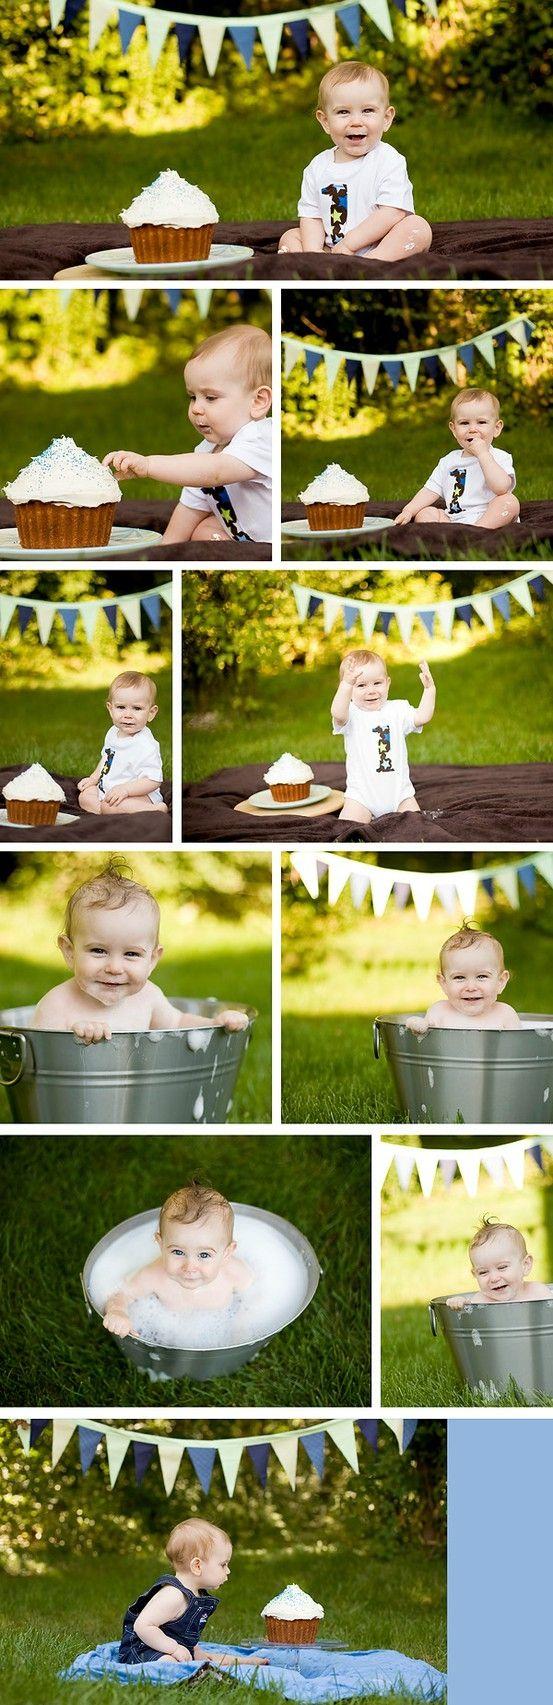 First Birthday Outdoor Cakesmash and Outdoor Bucket Bubble Bath